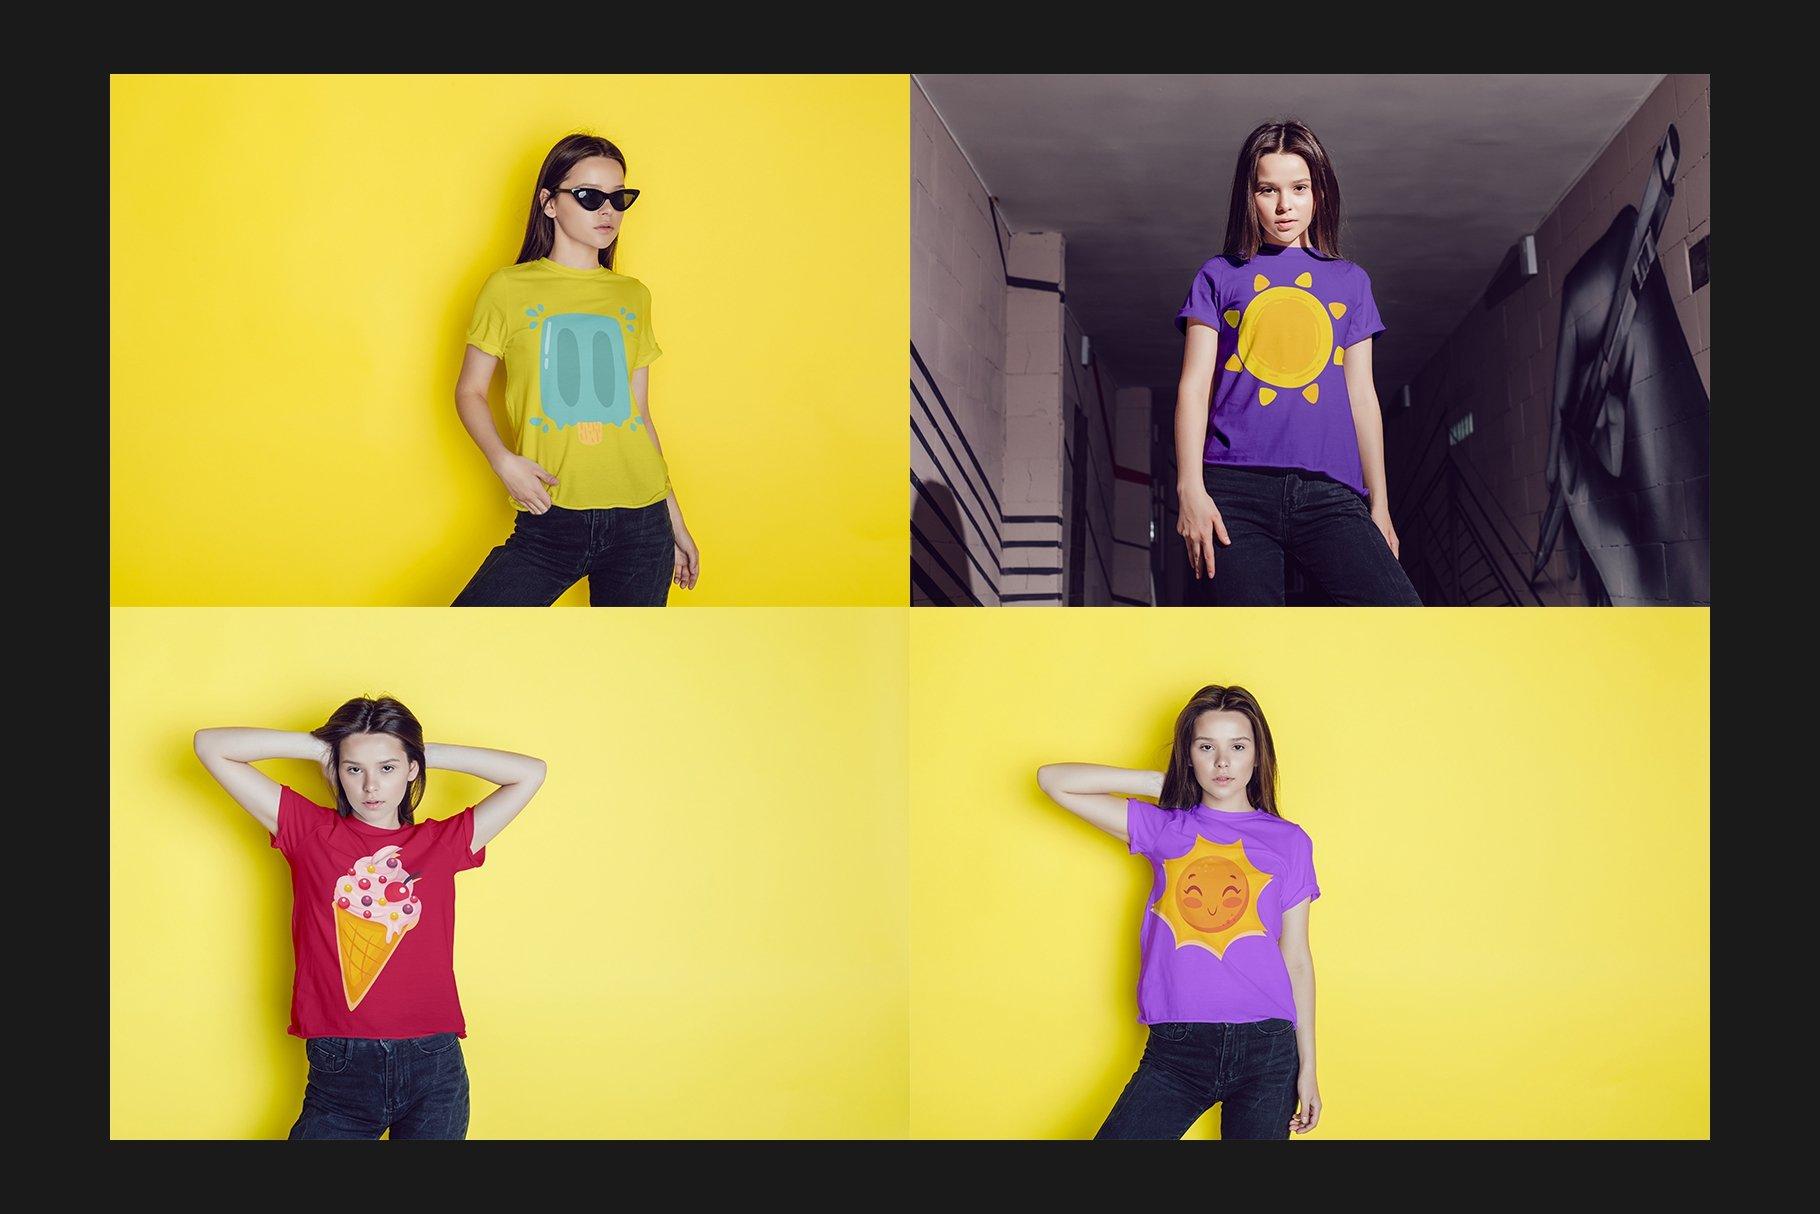 青少年T恤半袖衫印花图案设计展示样机合集 Teenager T-Shirt Mockup Set插图(6)